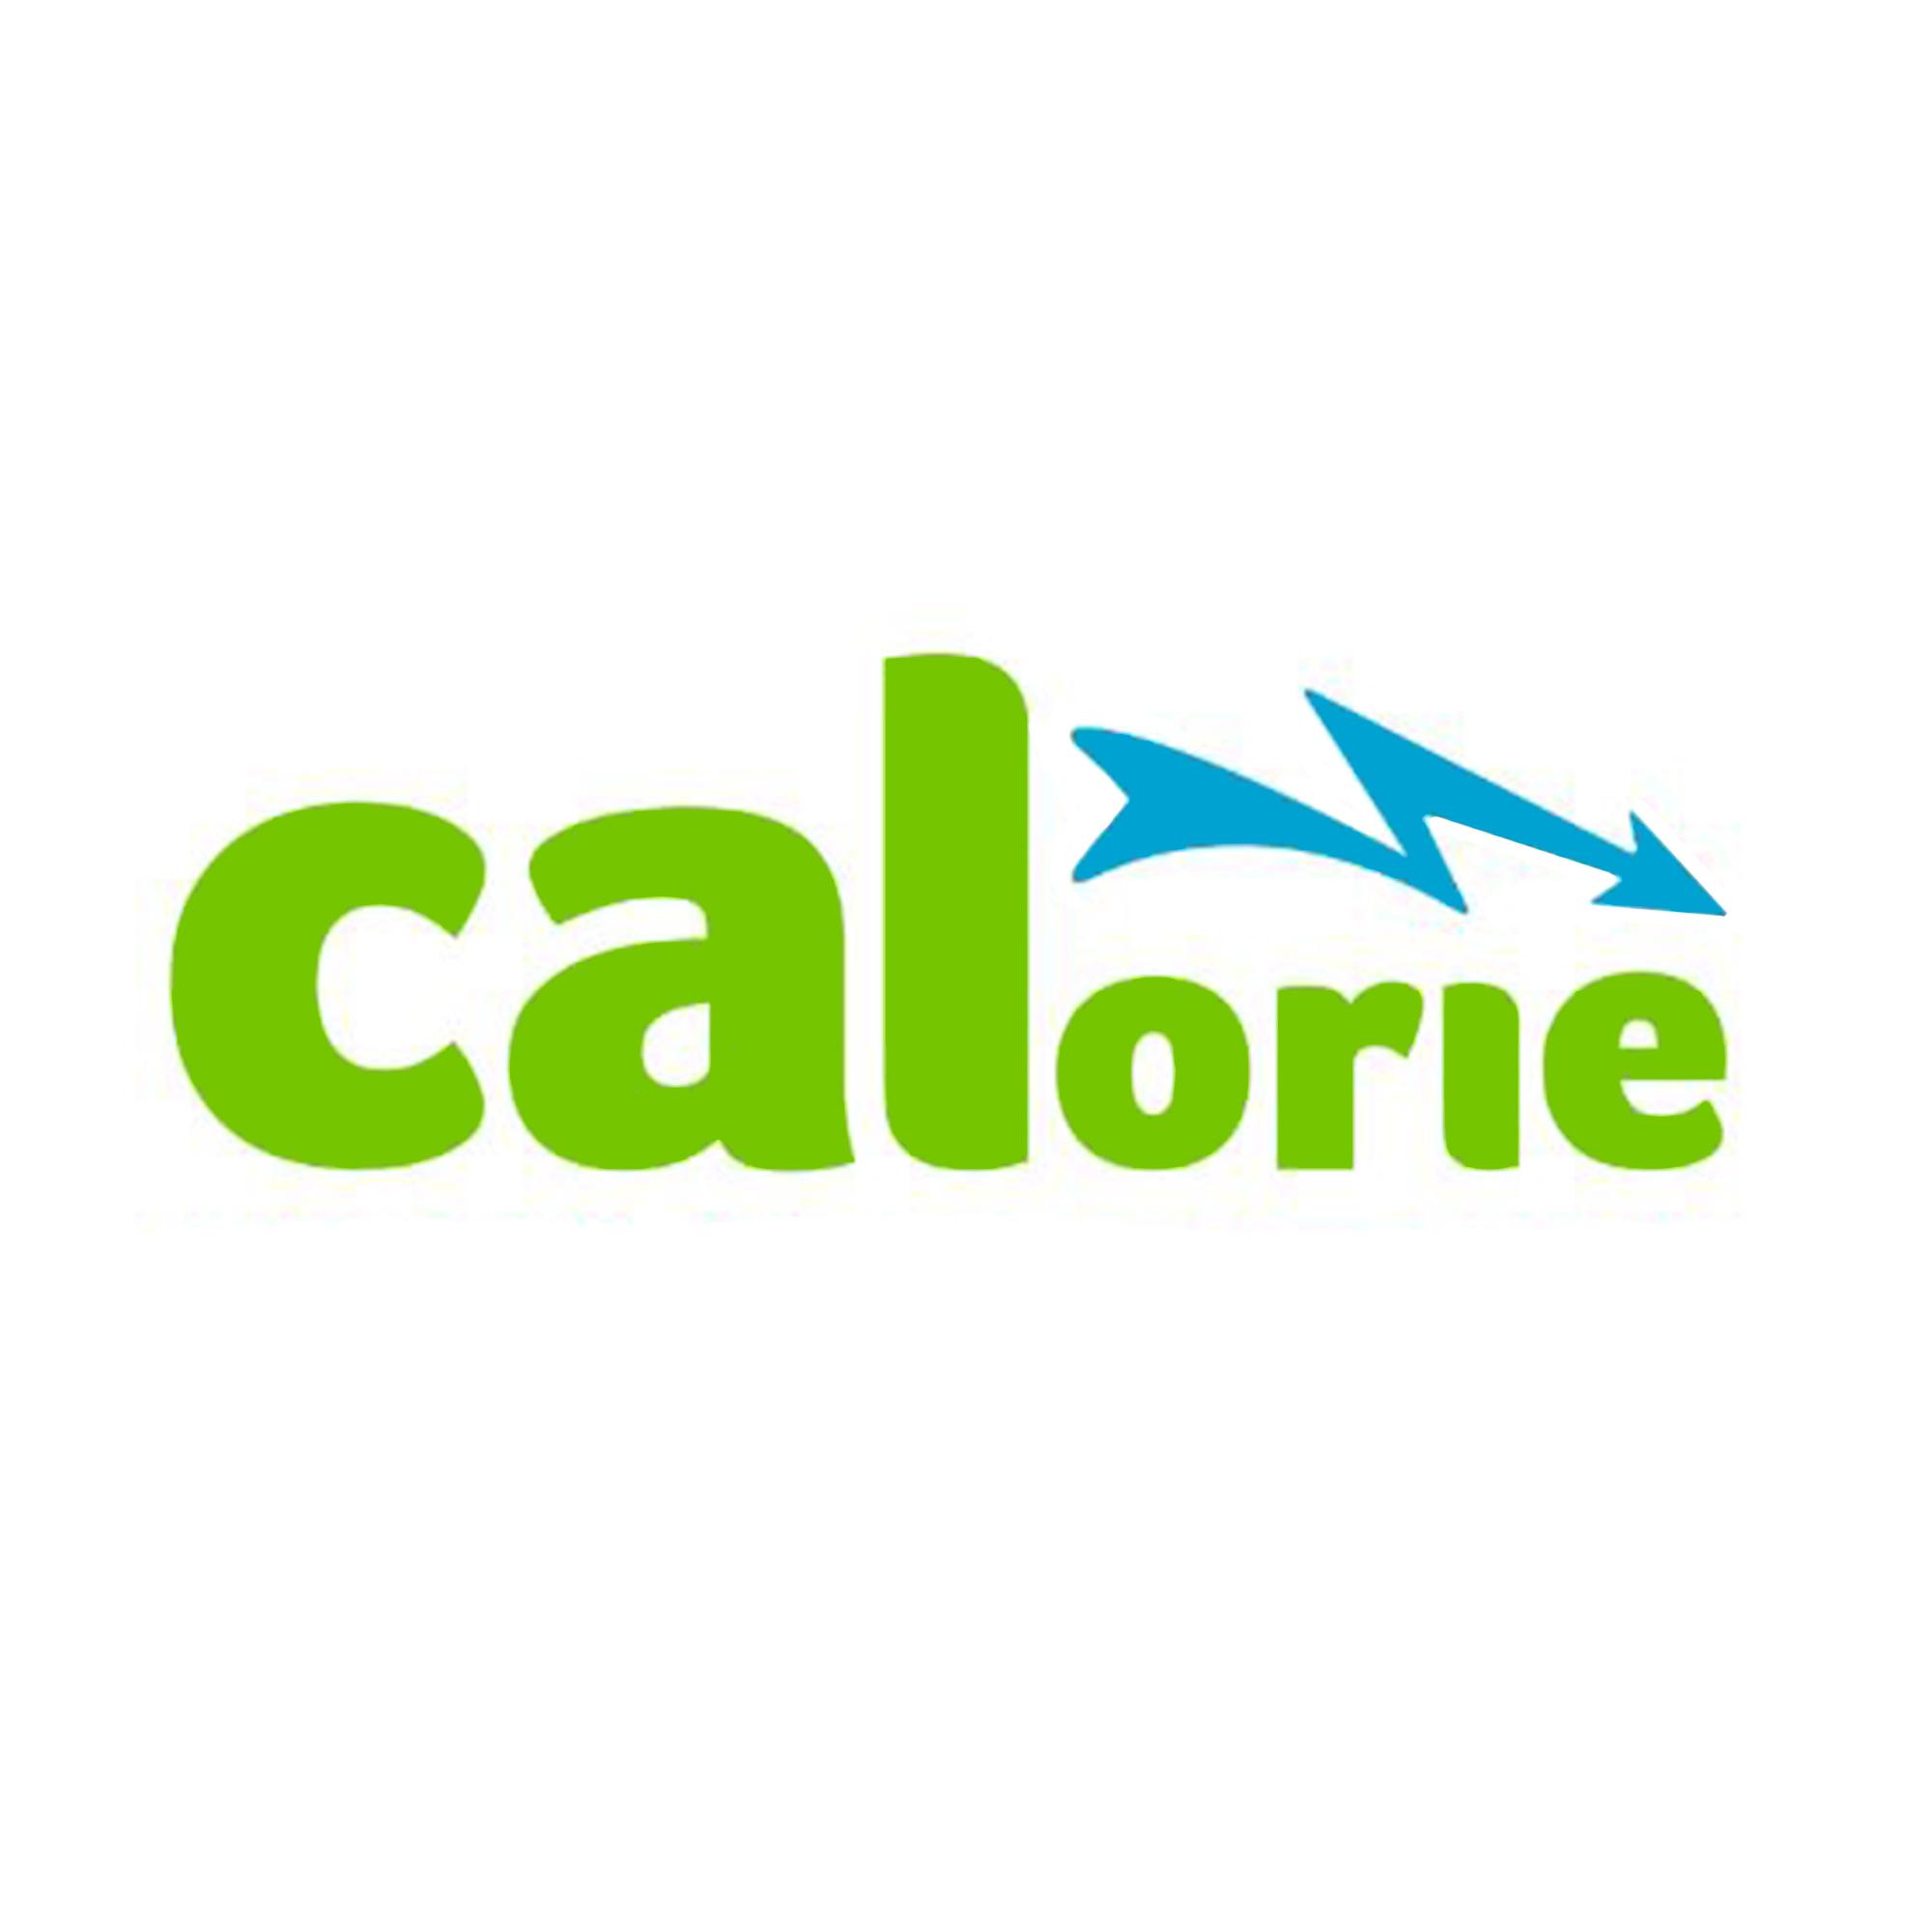 logo-Mockup-made-marketing-kennemer-CALorie